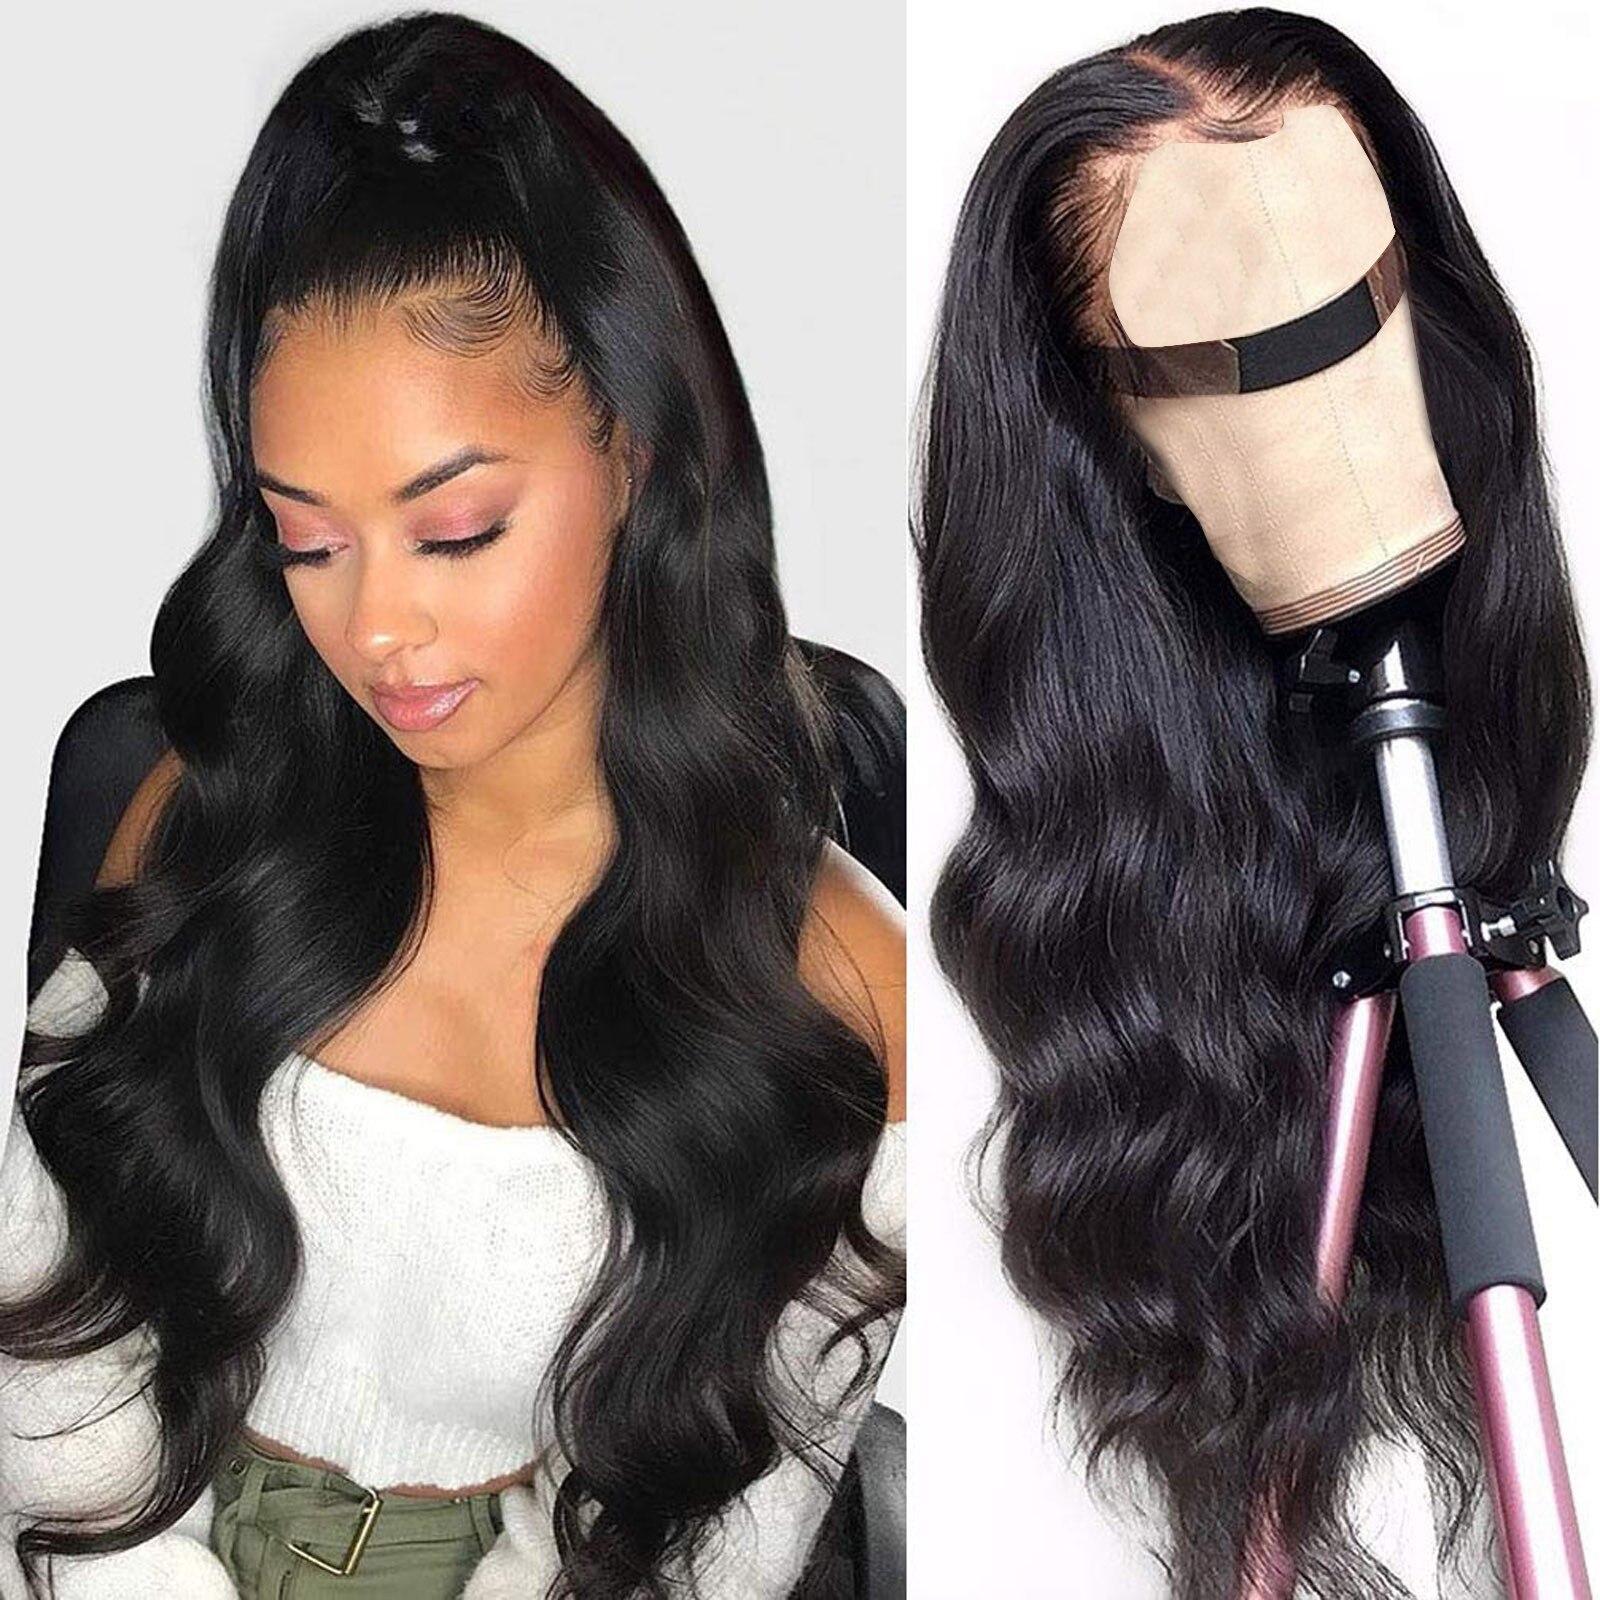 Brasileiro longo onda de água cabelo natural preto africano ladies pequenos conjuntos de cabelo encaracolado onda solta tecer cabelo 12-24 Polegada # g30